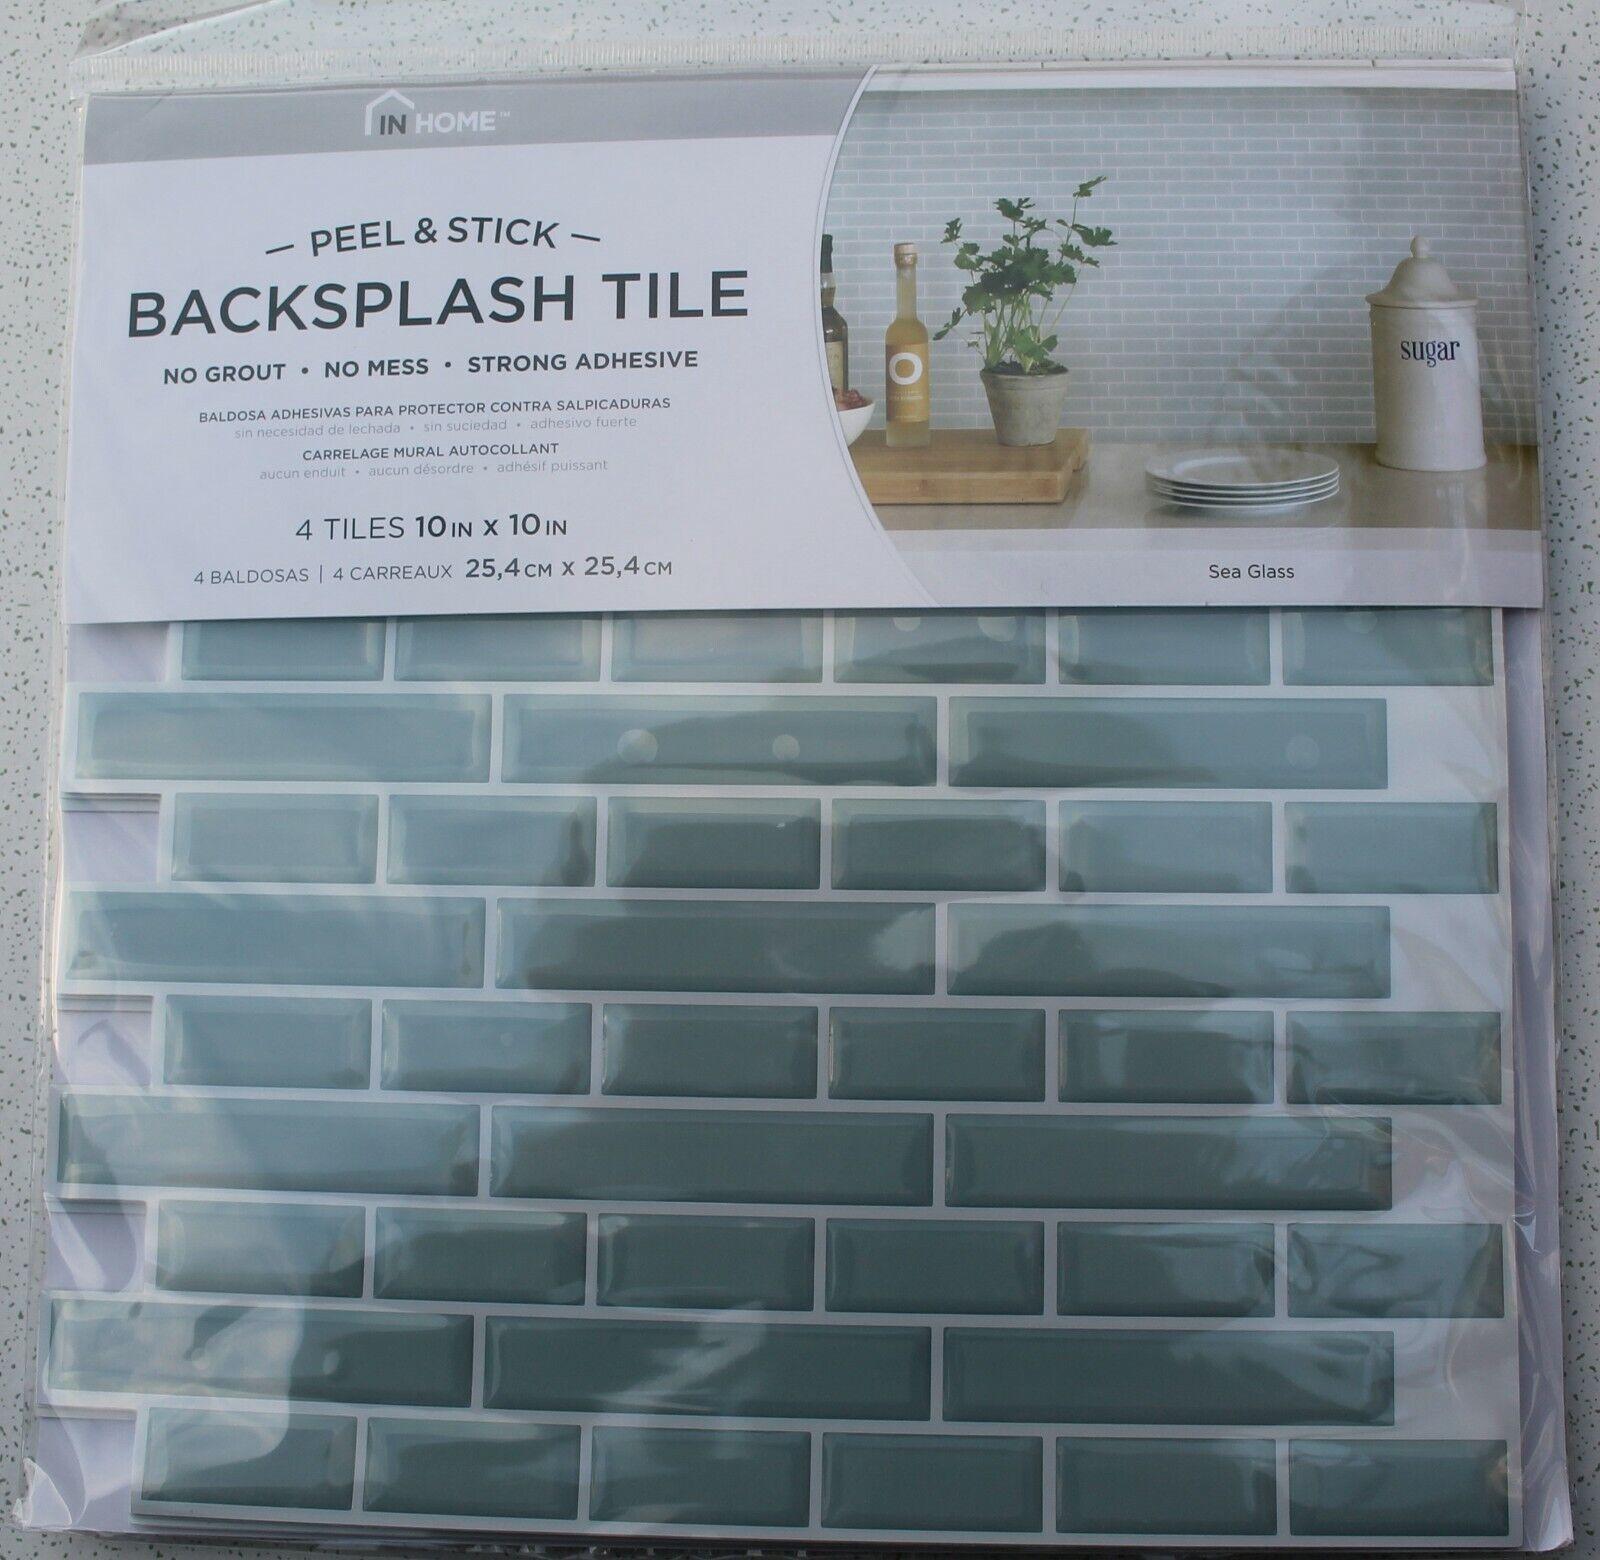 - Inhome NH2361 Sea Glass Peel And Stick Backsplash Tiles Blue For